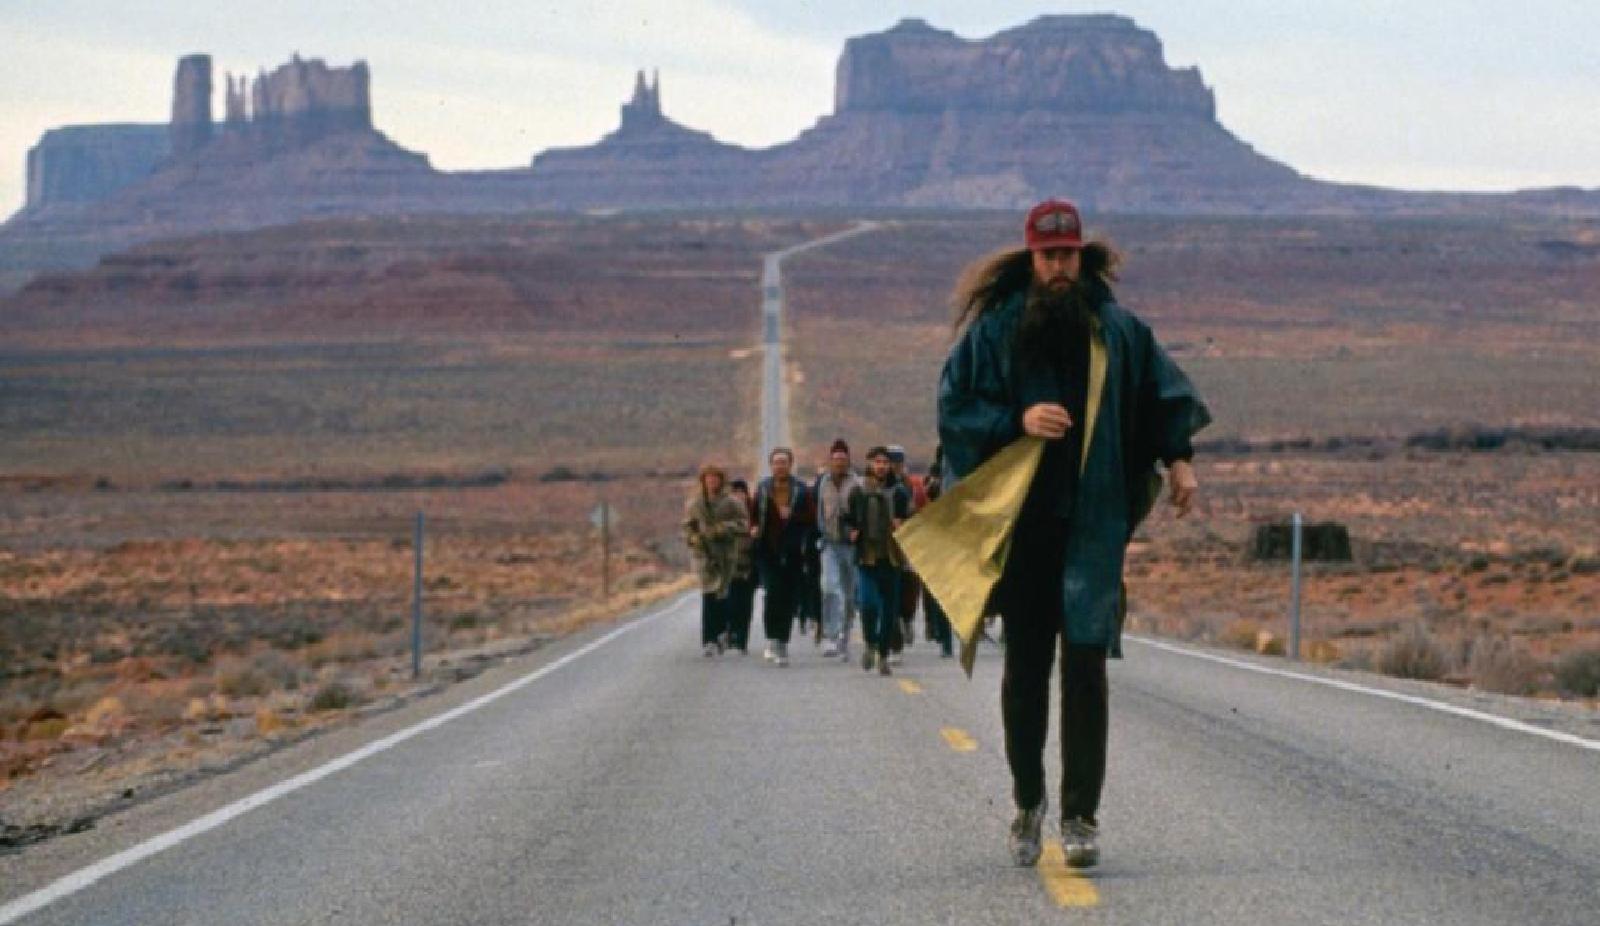 The Best Picture Winners Forrest Gump 1994 Armchaircinema Com Armchaircinema Com